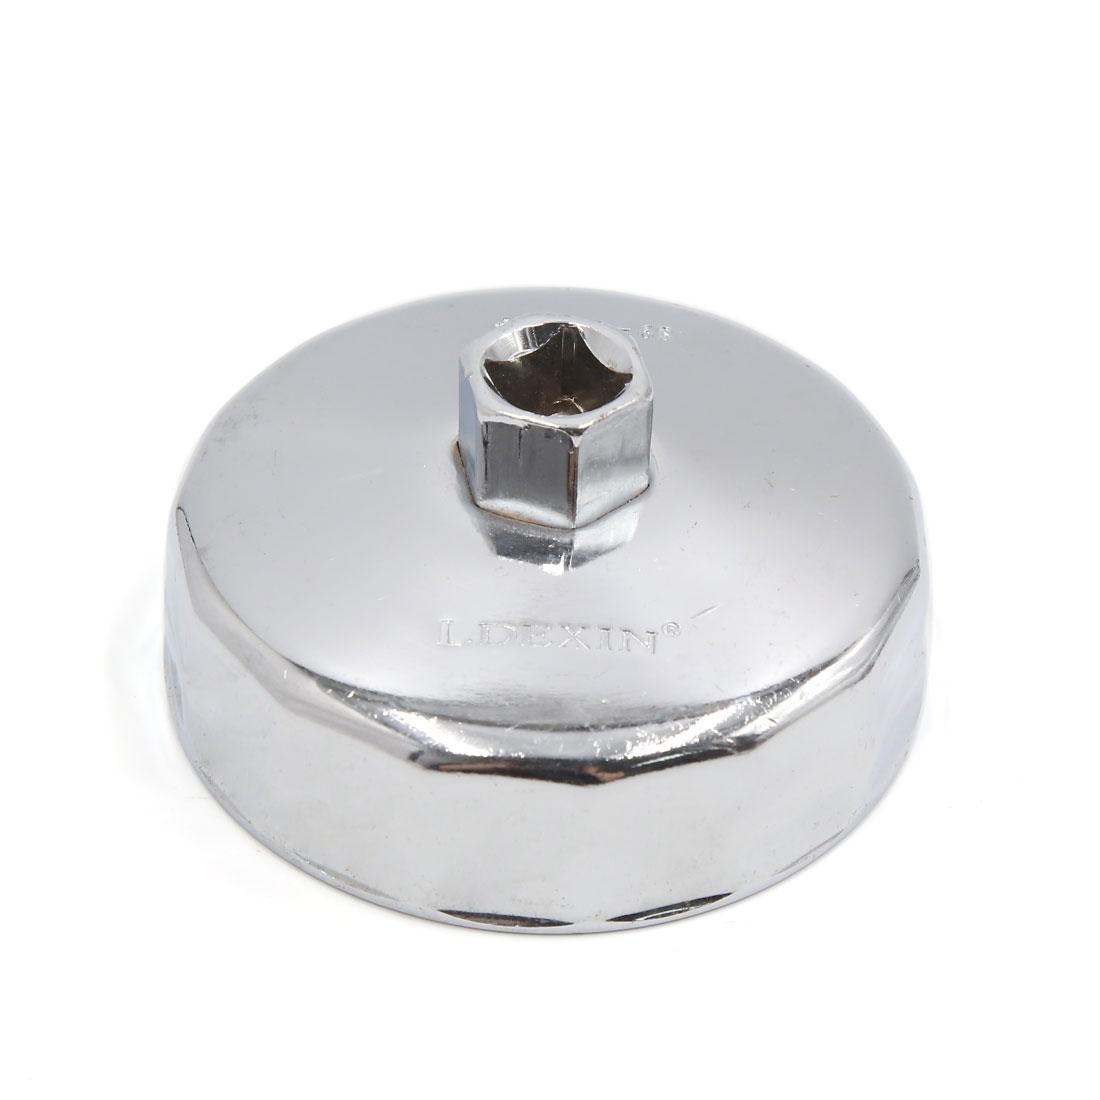 13mm Square Socket 15 Flutes 89mm Inside Diameter Cap-Type Oil Filter Wrench Spanner for Car Vehicle